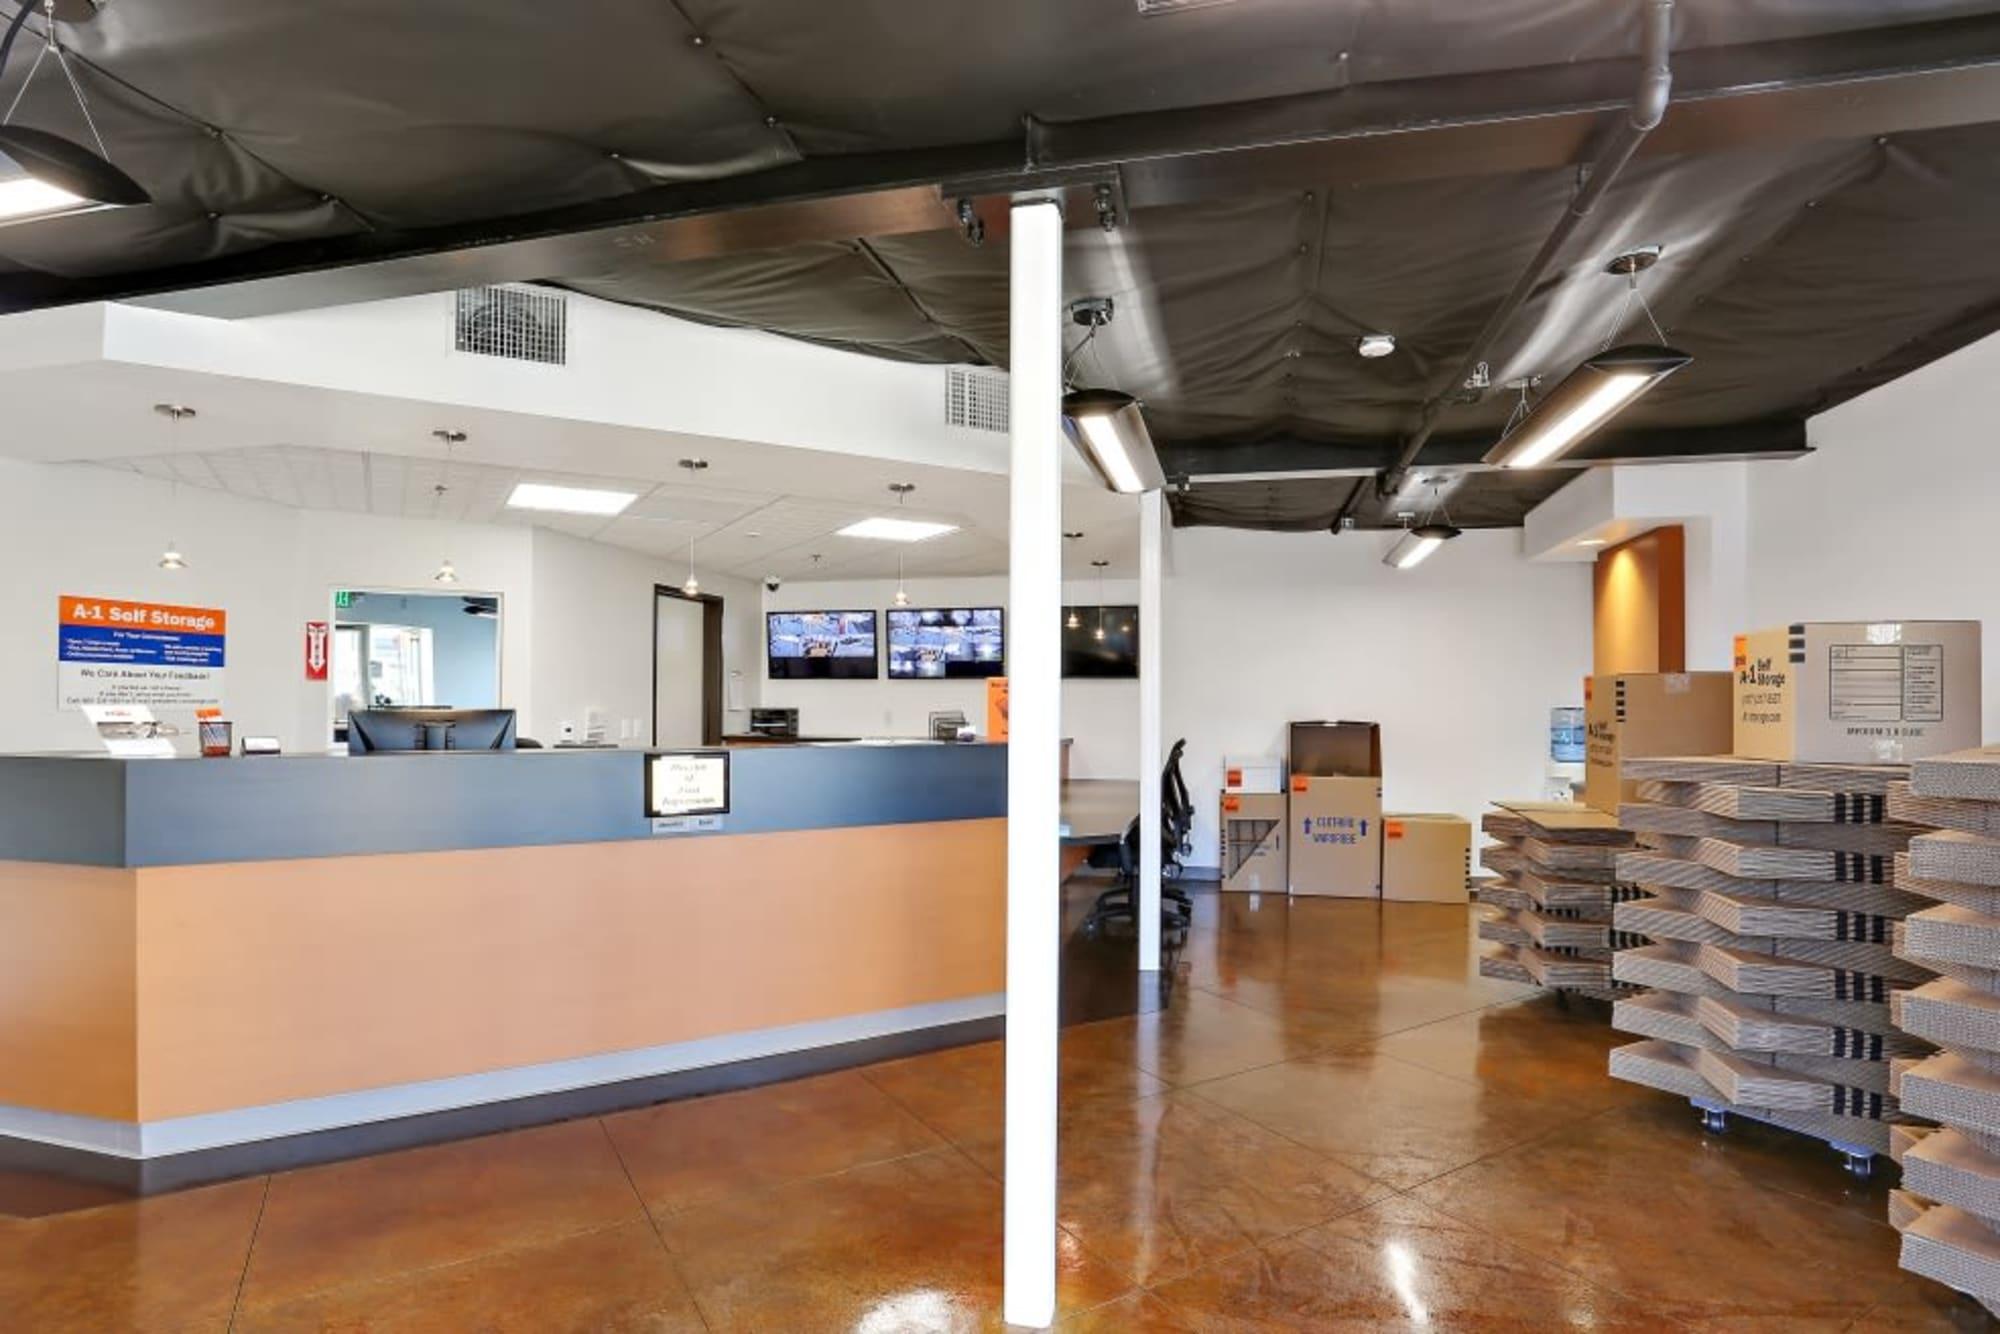 Service desk at A-1 Self Storage in San Diego, California